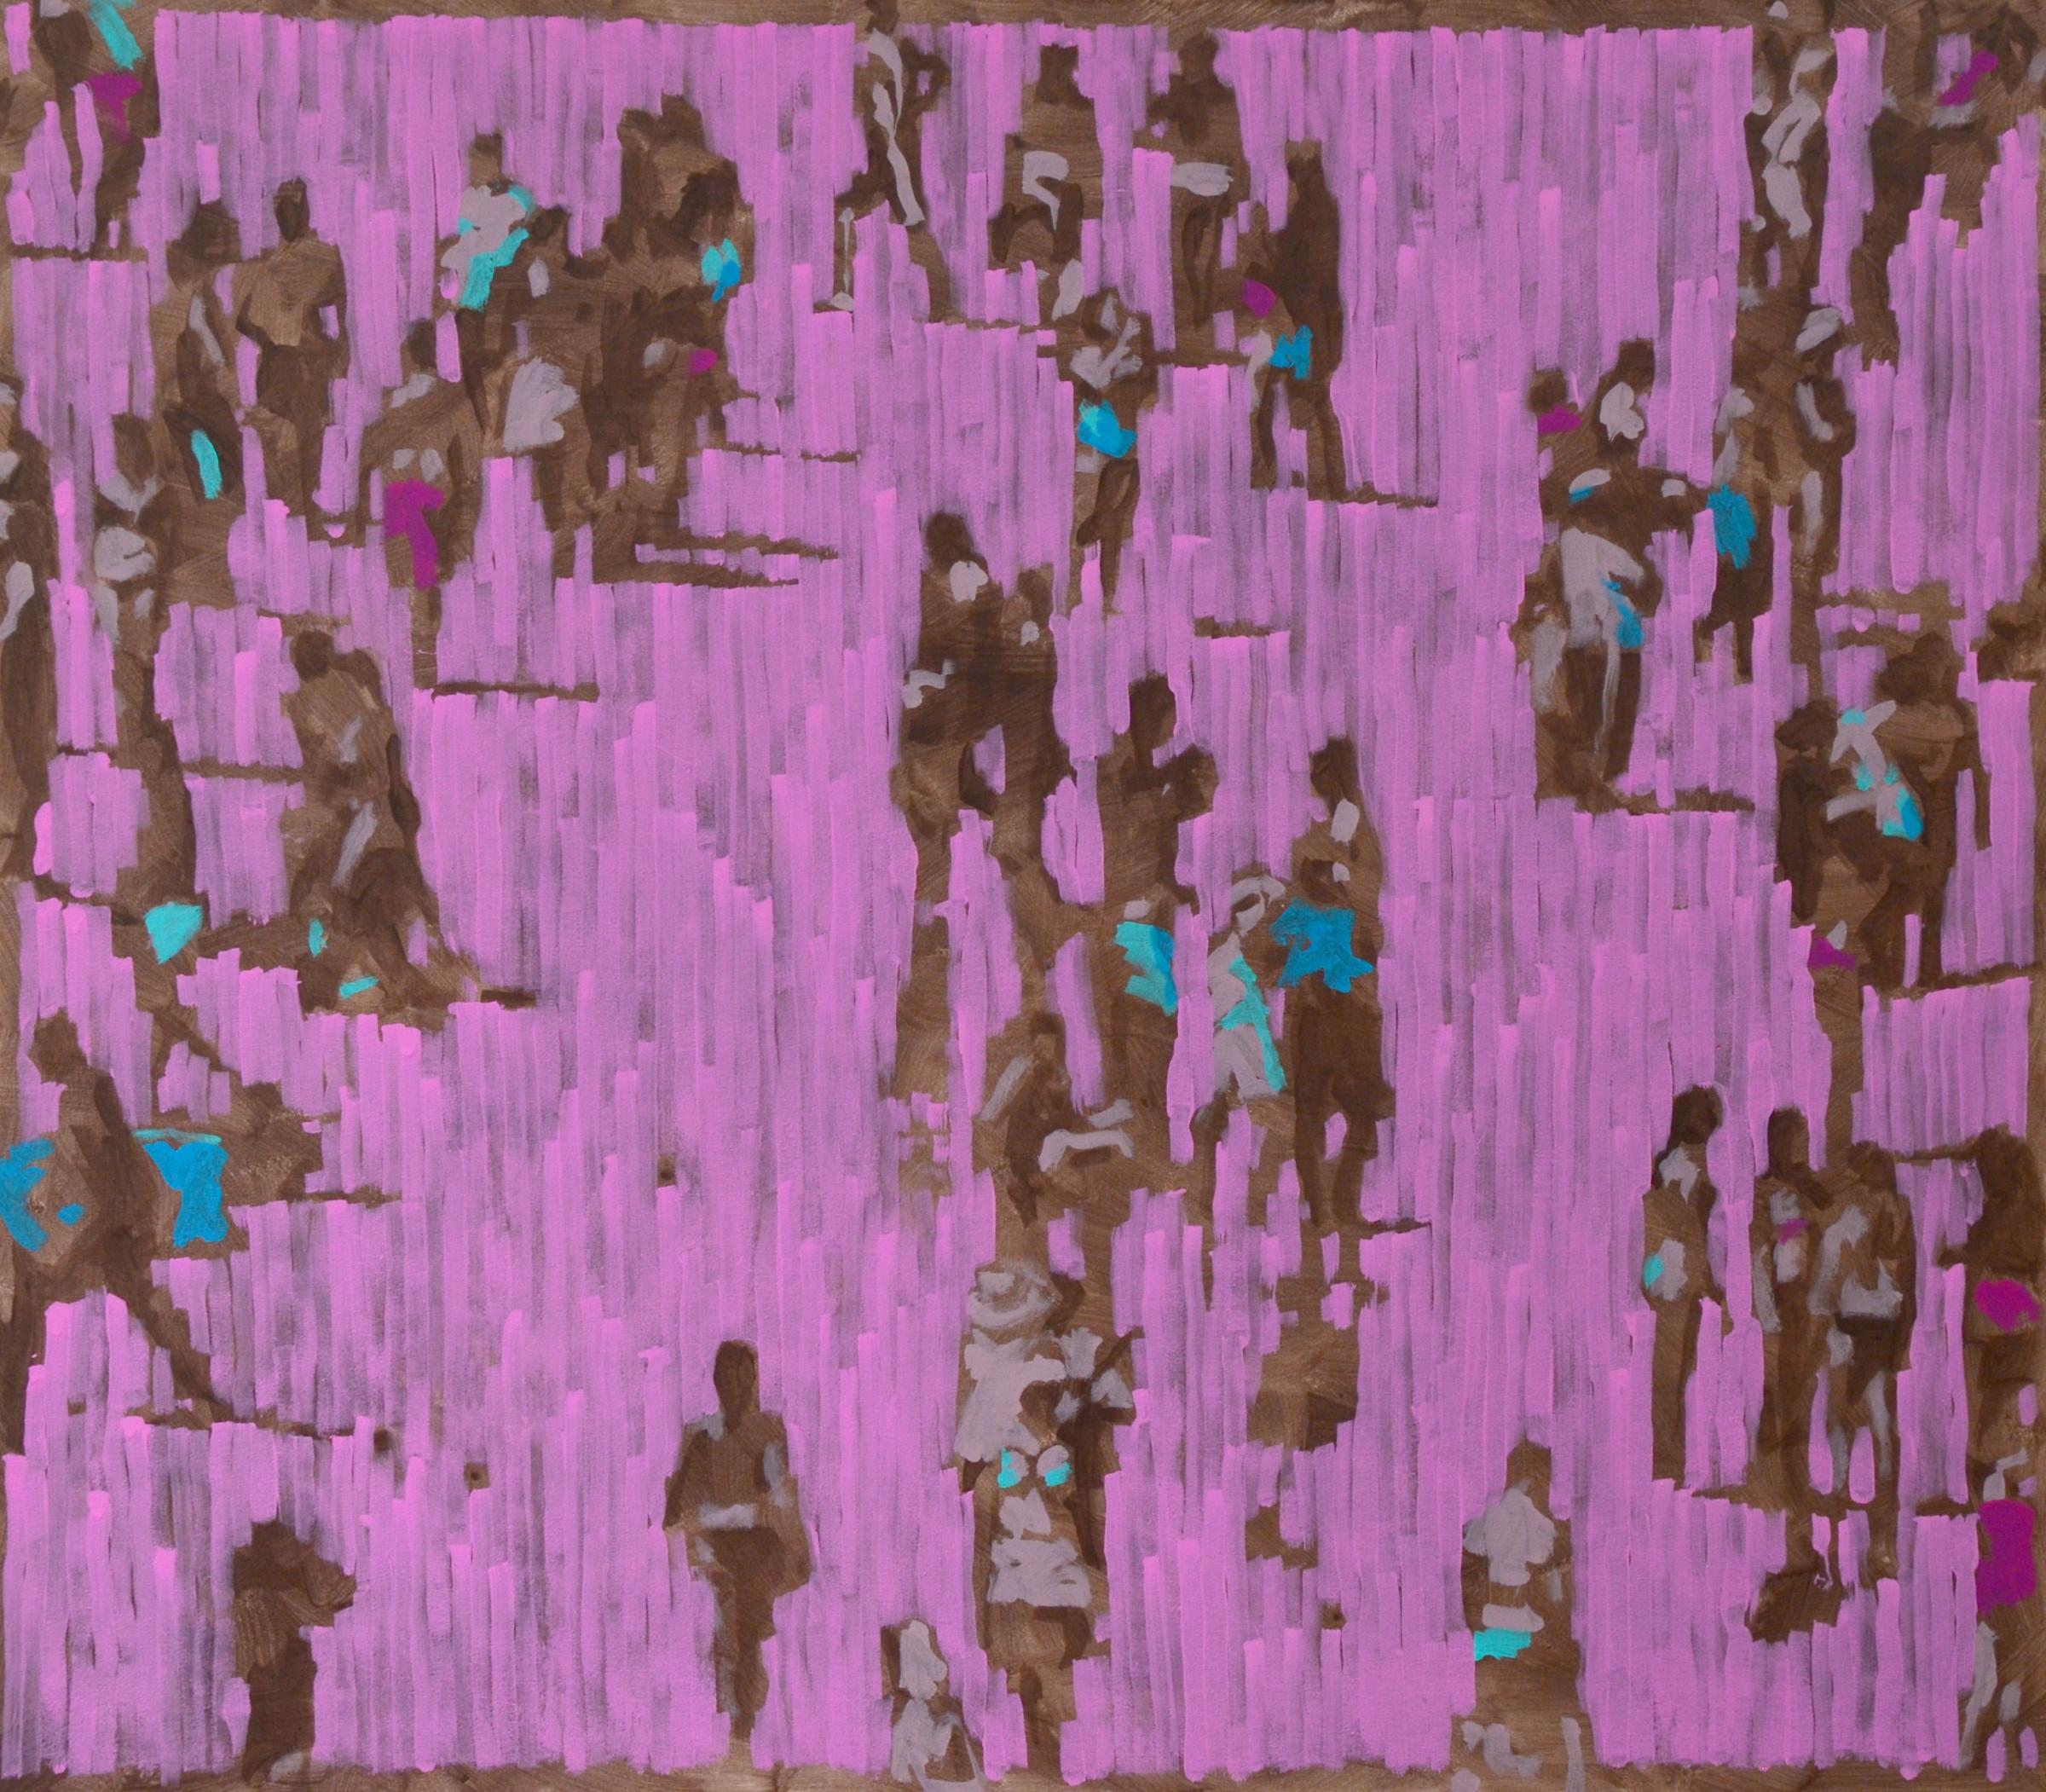 "<span class=""link fancybox-details-link""><a href=""/artists/42-nick-bodimeade/works/5859-nick-bodimeade-magenta-beach-2018/"">View Detail Page</a></span><div class=""artist""><strong>Nick Bodimeade</strong></div> b. 1957 <div class=""title""><em>Magenta Beach</em>, 2018</div> <div class=""signed_and_dated"">signed, titled and dated on reverse</div> <div class=""medium"">oil on canvas</div> <div class=""dimensions"">105 x 120 cm<br /> 41 3/8 x 47 1/4 inches</div><div class=""price"">£4,400.00</div><div class=""copyright_line"">Own Art: £ 250 x 10 Months, 0% APR + £ 1,900 deposit</div>"